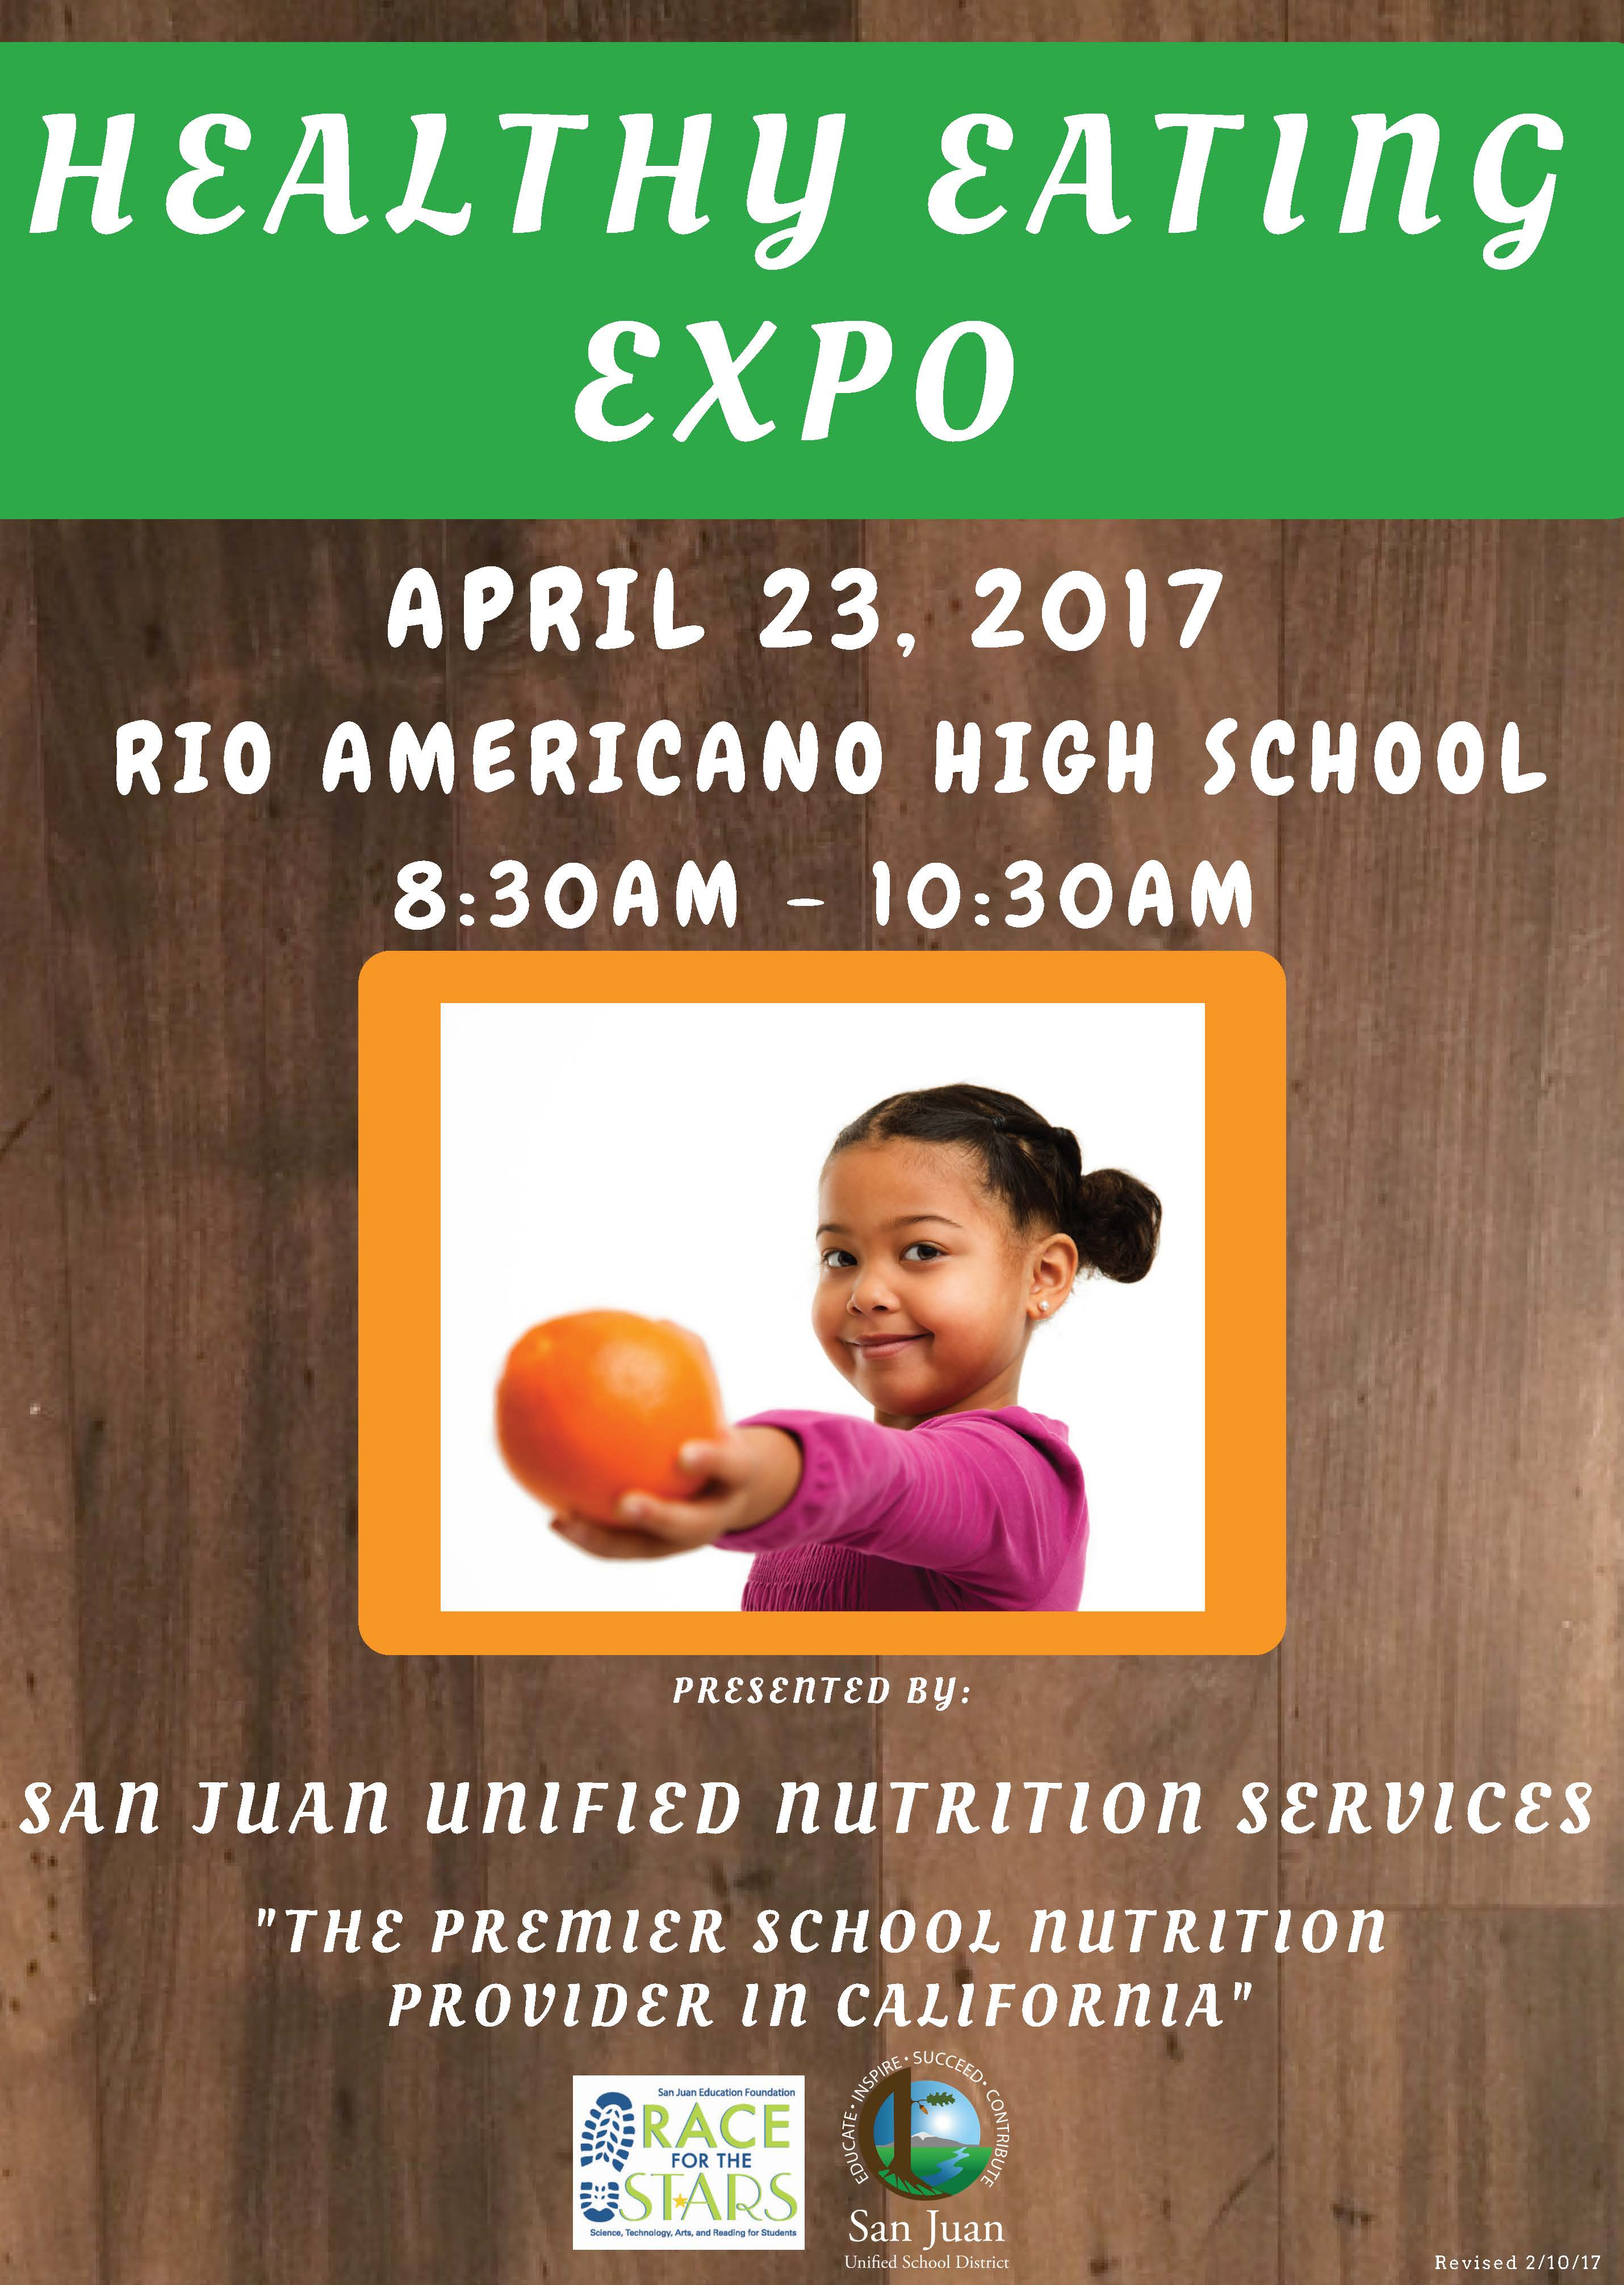 San Juan Unified School District Food Services